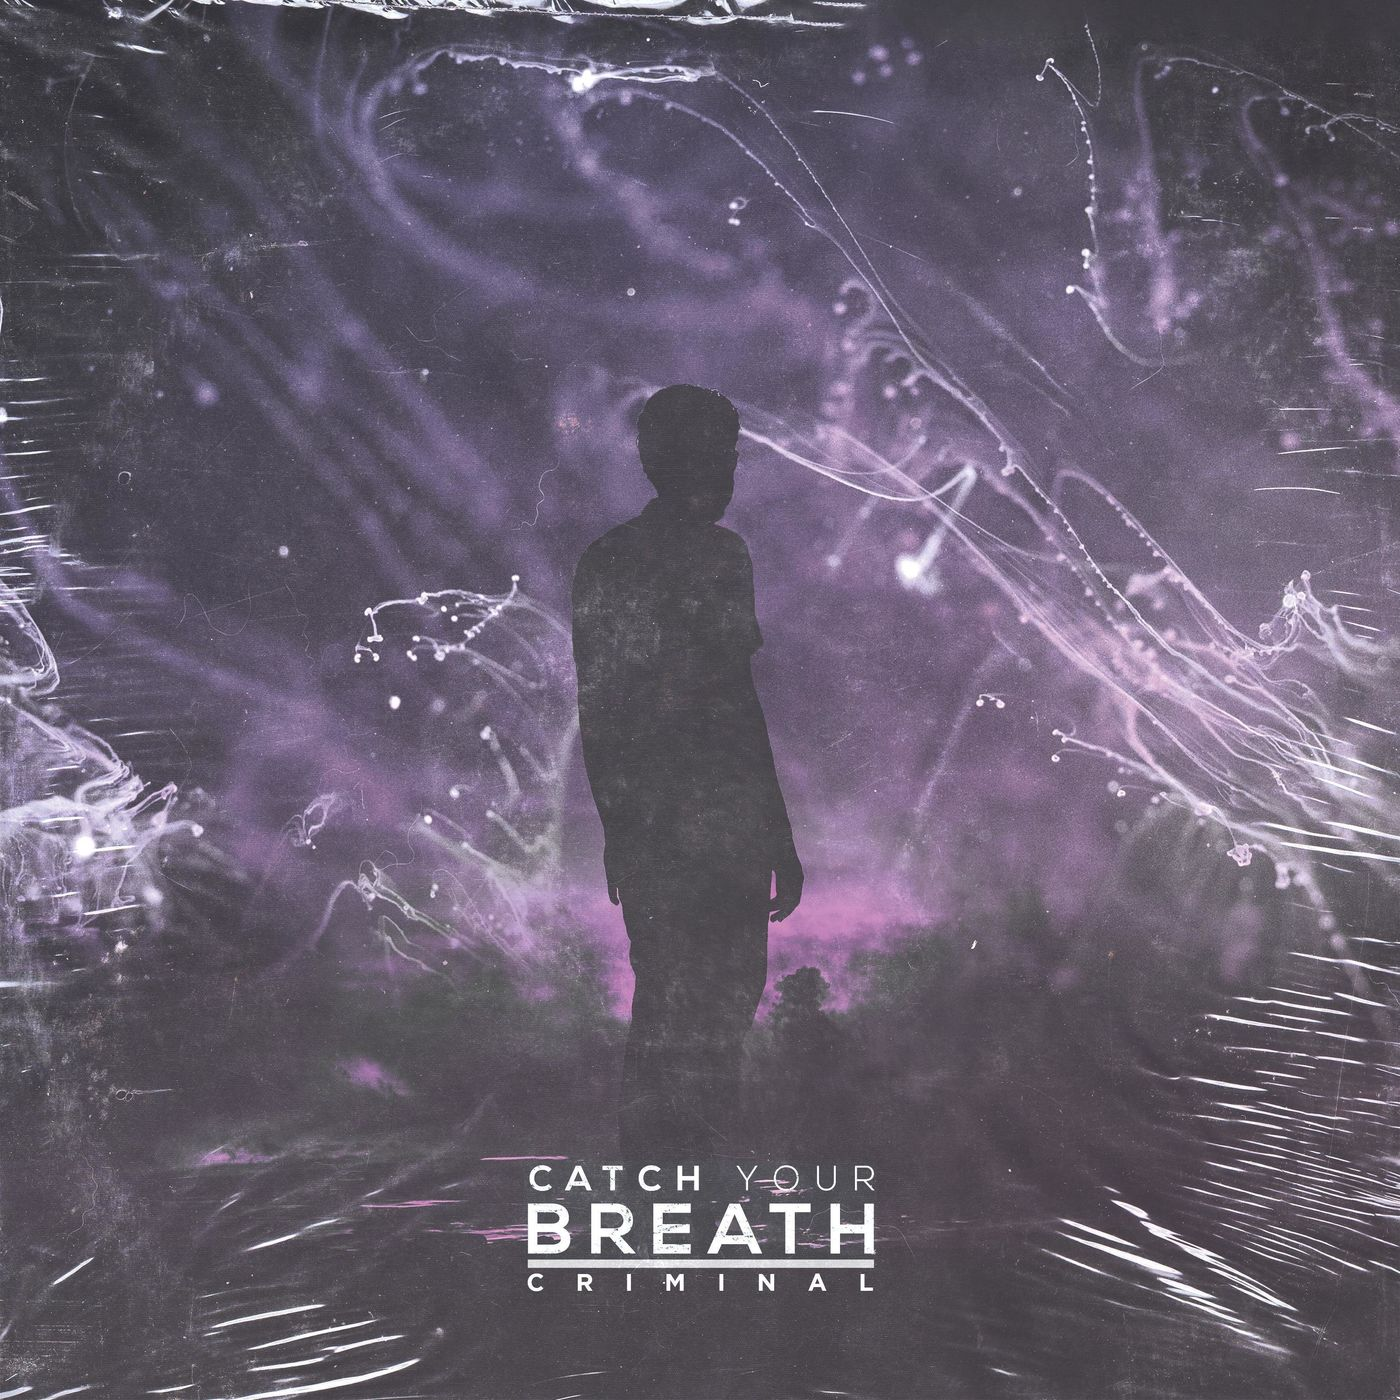 Catch Your Breath - Criminal [single] (2020)